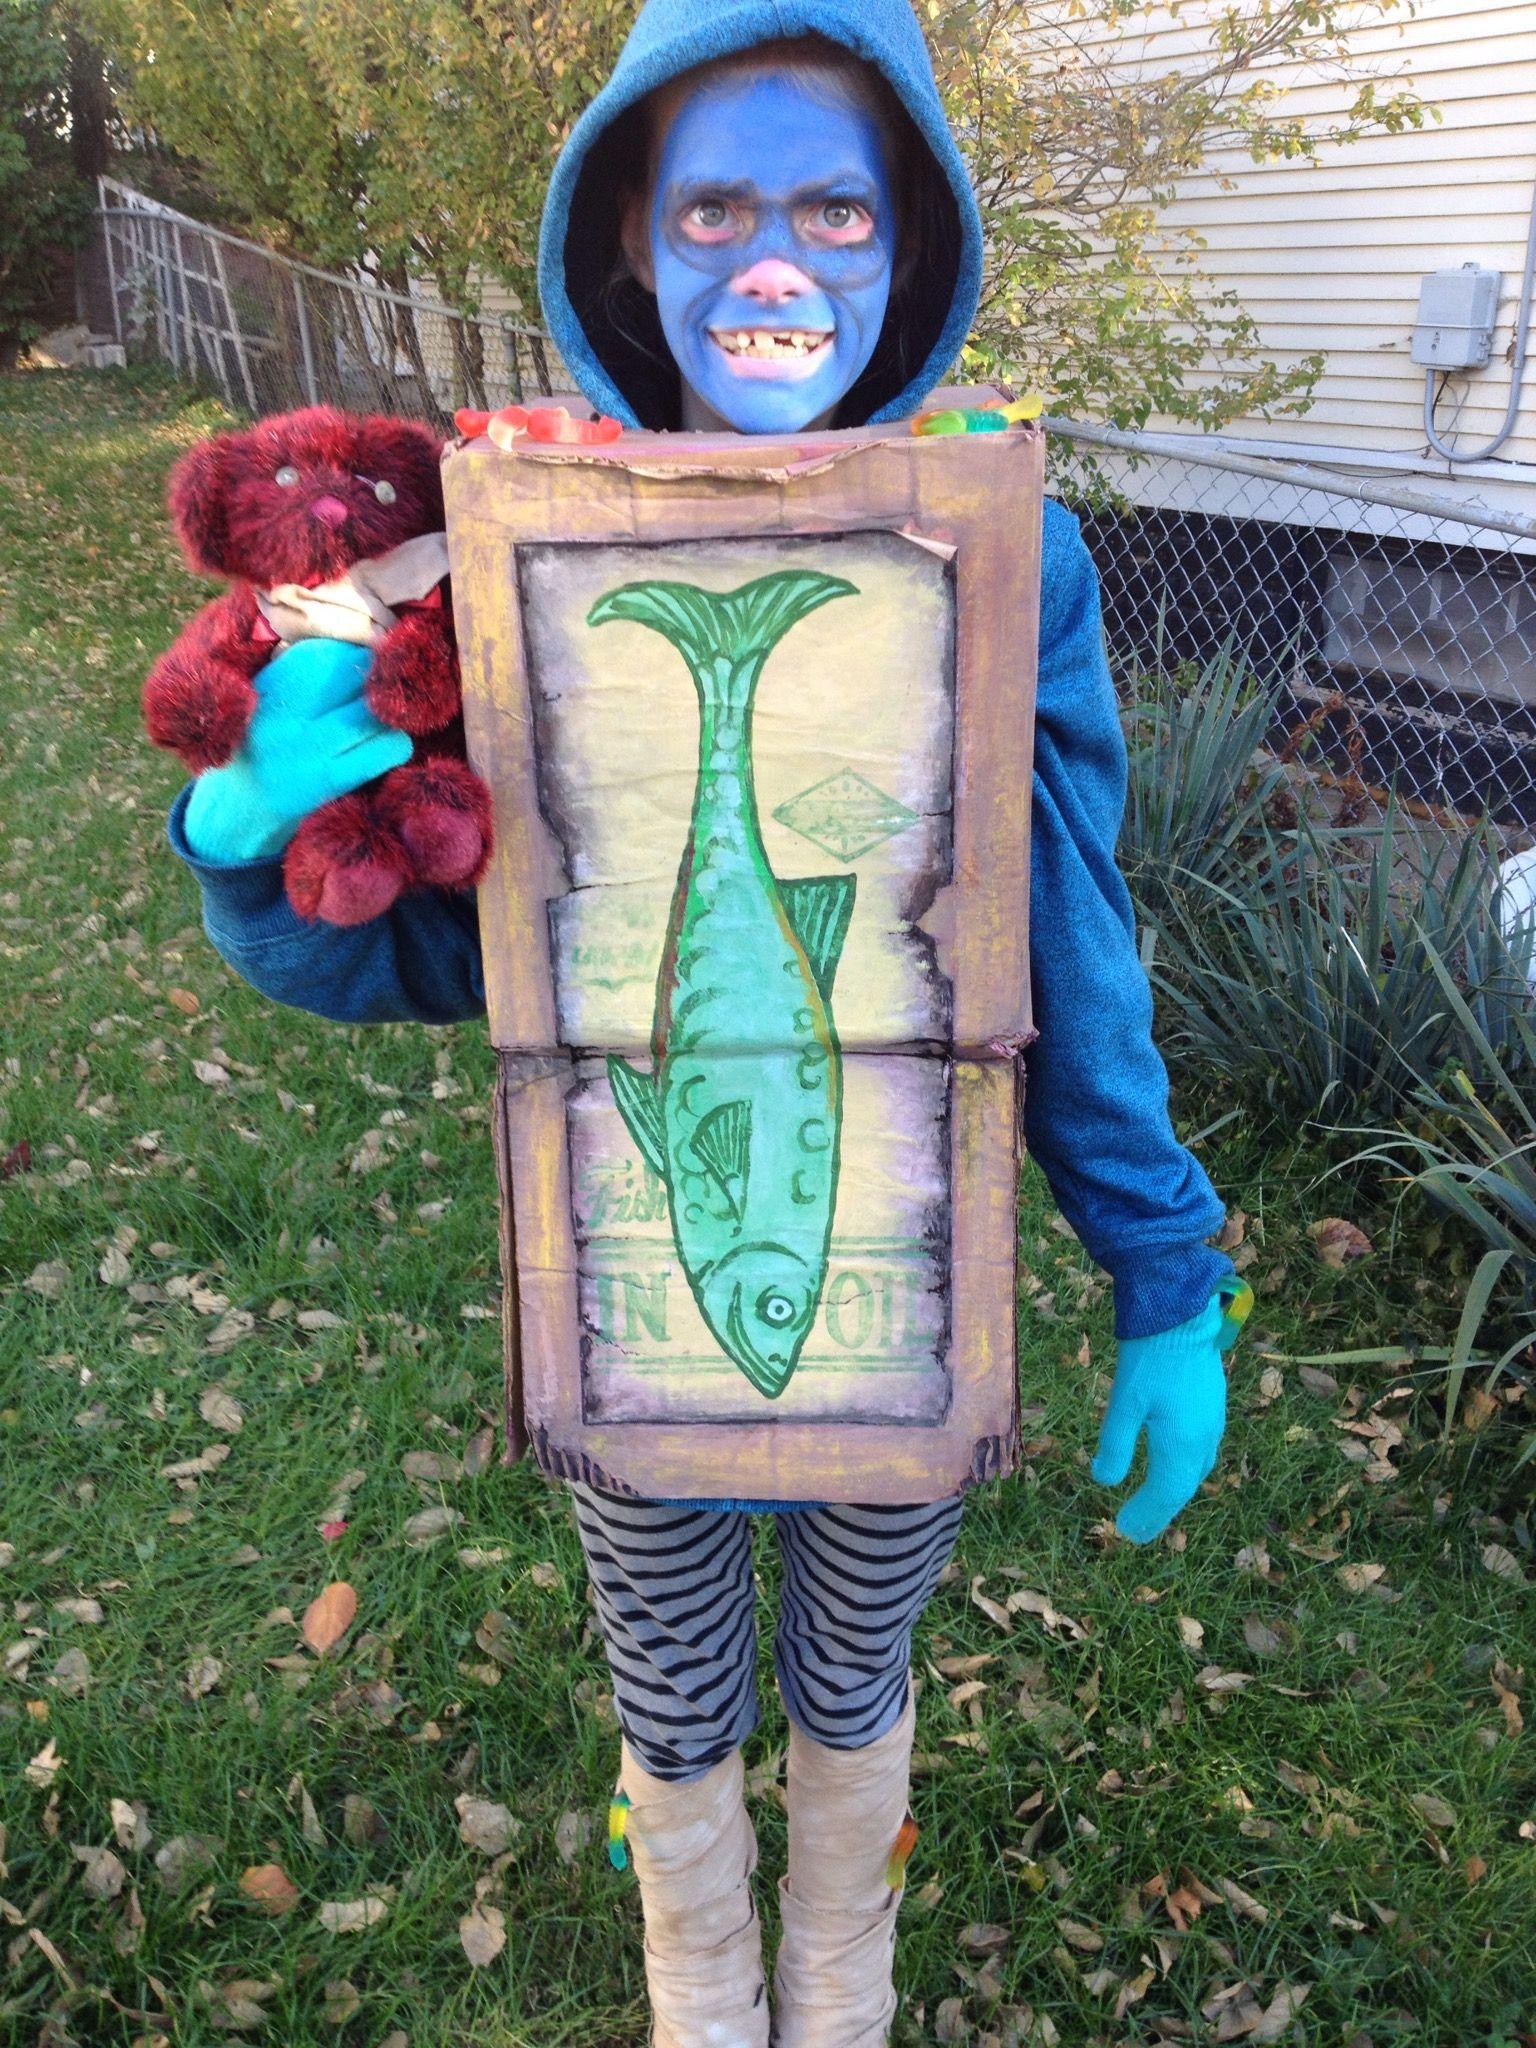 Fish the Boxtroll Costume | Movies box and Paper mache